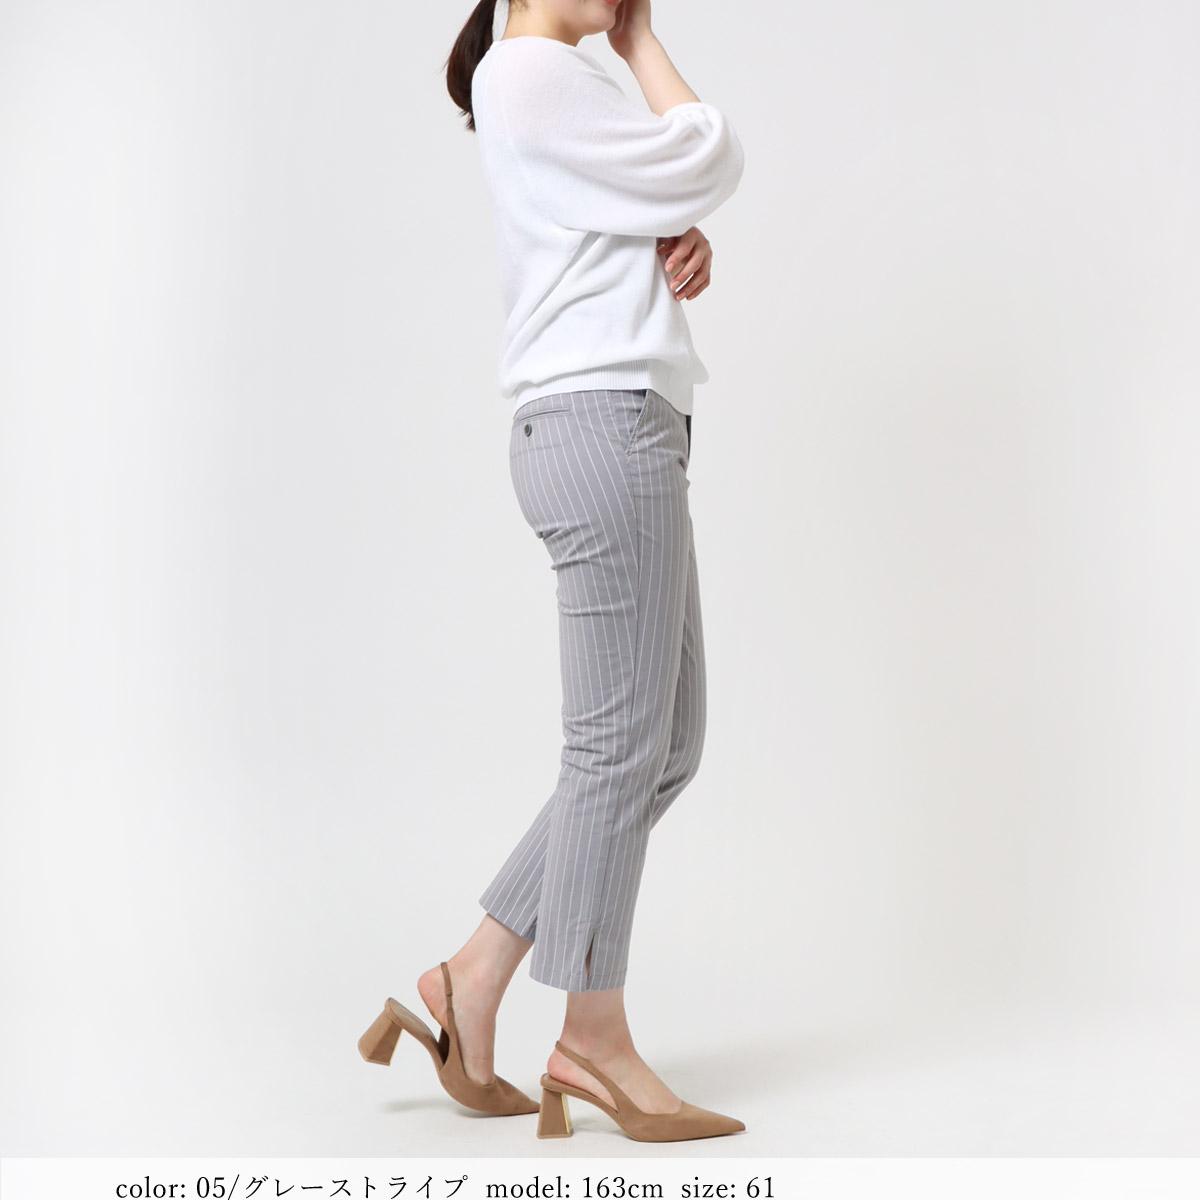 【DENIM LIFE限定商品】スリット入りアンクル CAA342